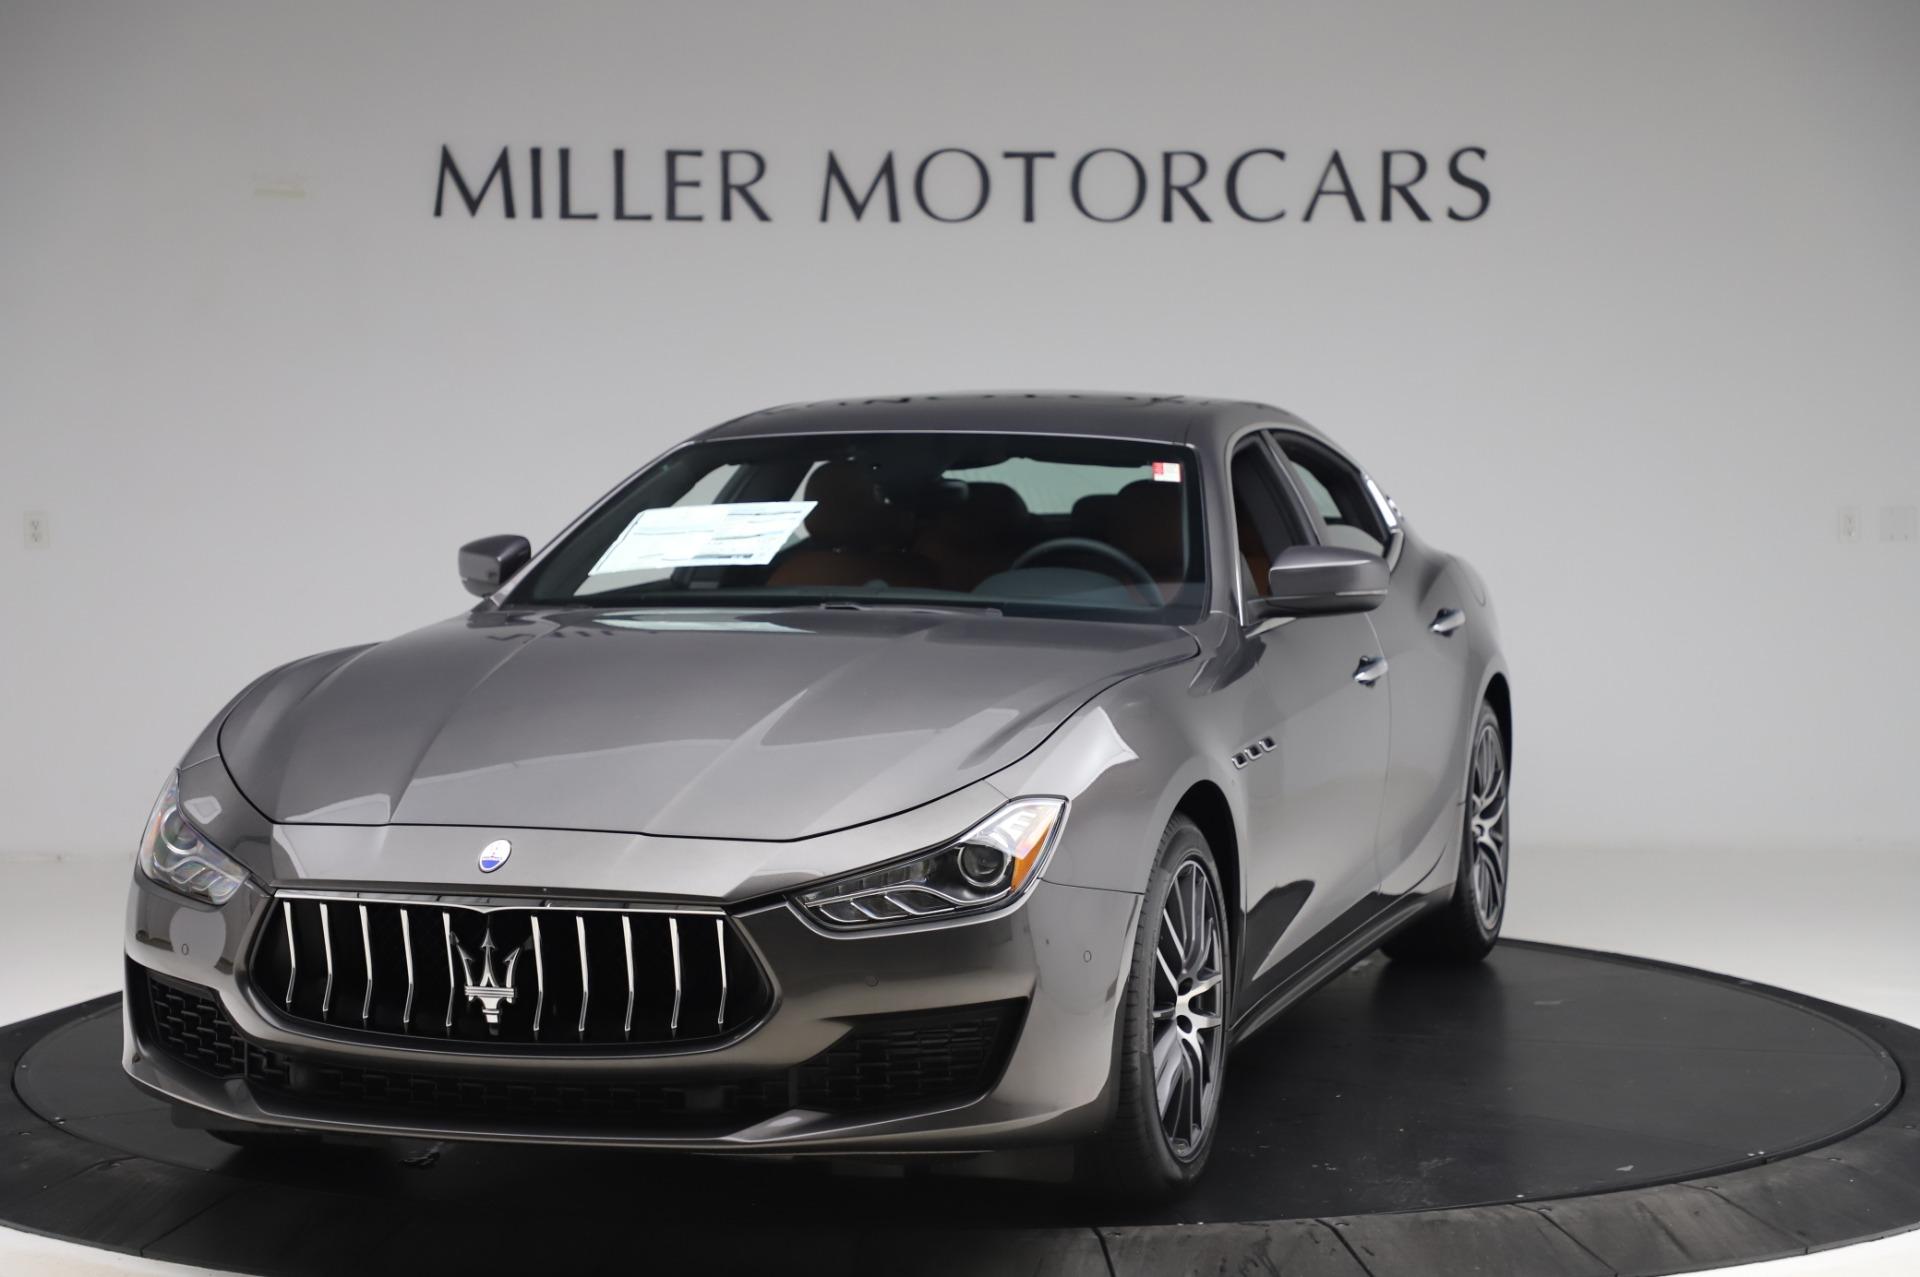 New 2020 Maserati Ghibli S Q4 for sale $82,385 at Maserati of Greenwich in Greenwich CT 06830 1